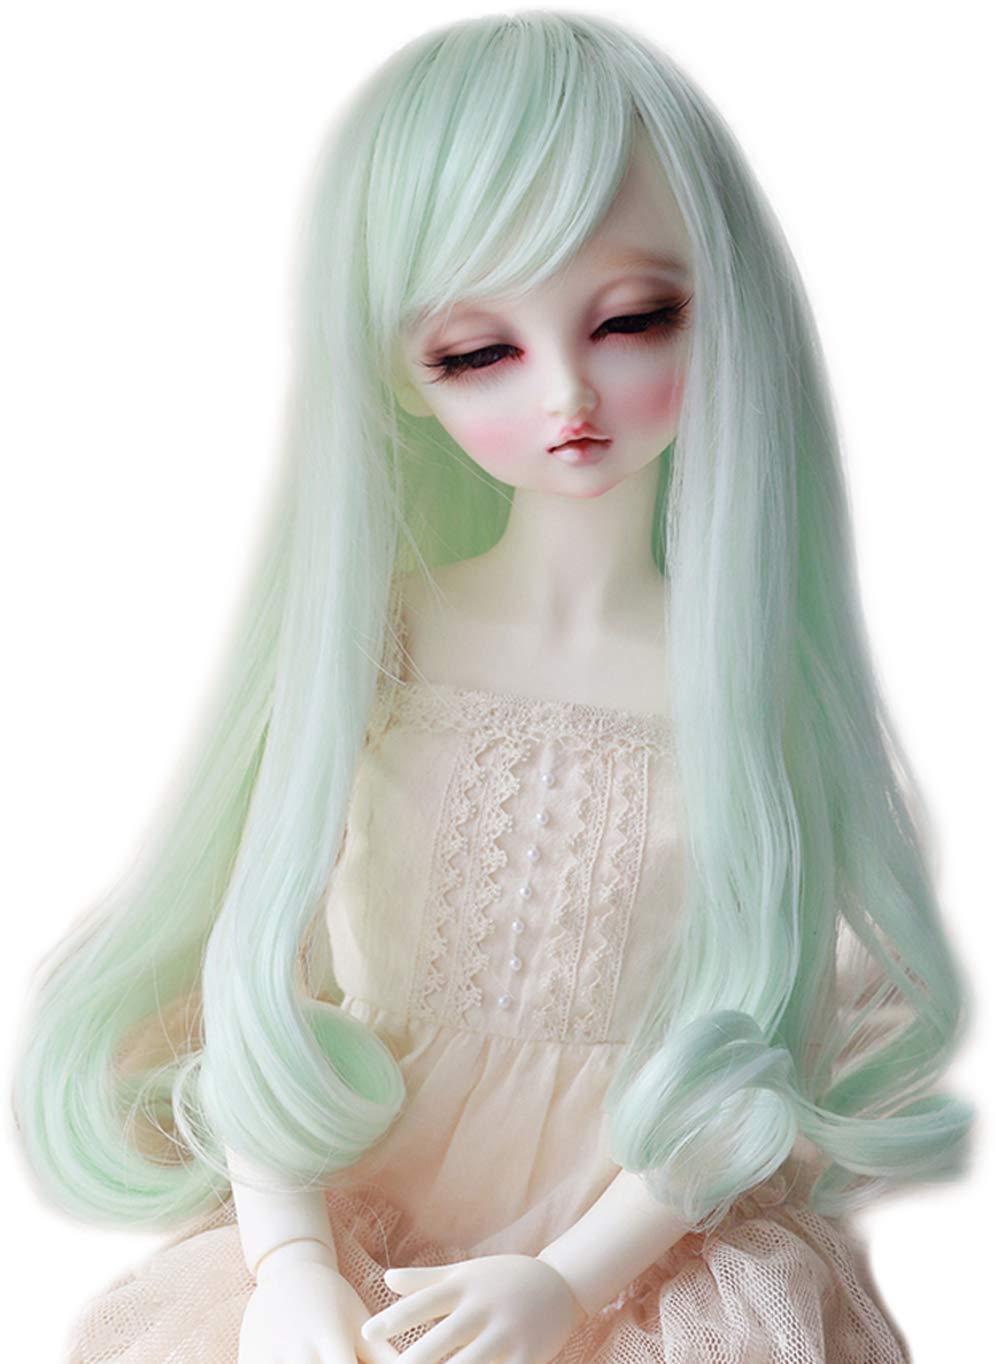 5c1e9fb1d1be4 Linfairy 8-9 inch 1/3 BJD Wig Doll Hair SD DZ DD DOD LUTS Long Wig (Mint)